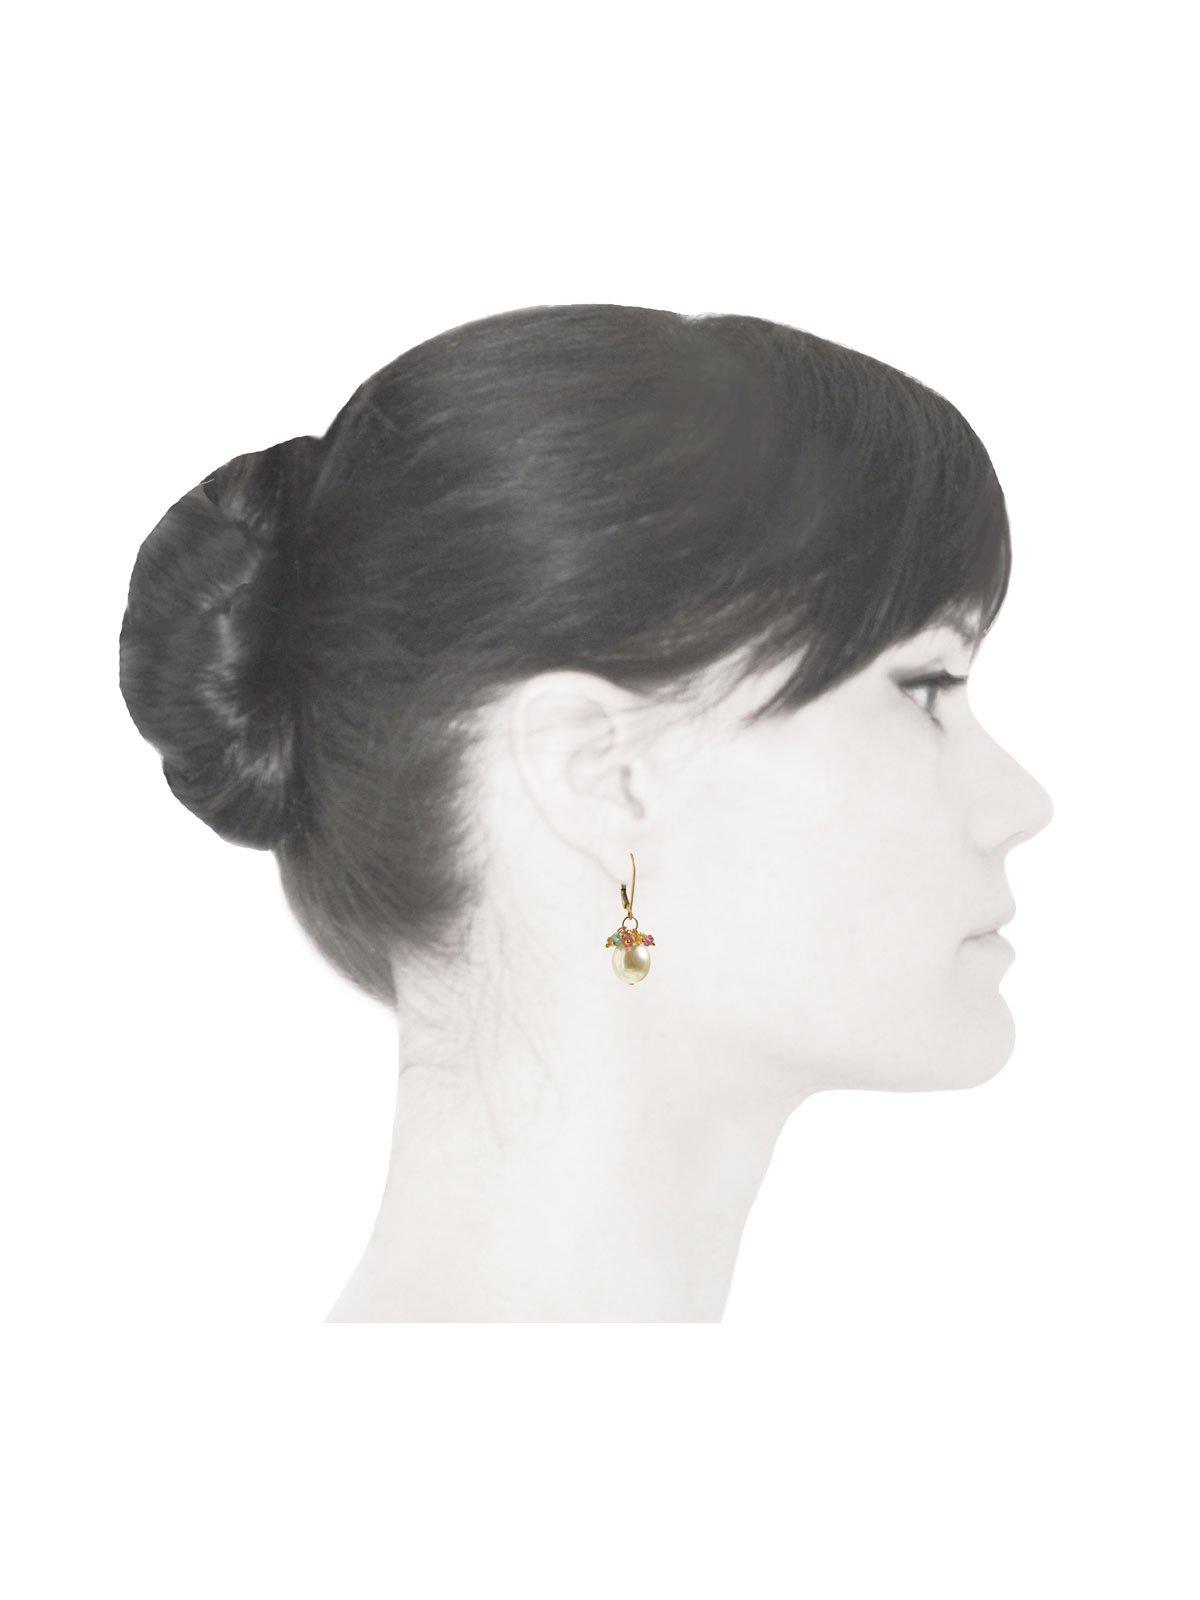 Delanacre Baroque South Sea Pearl Tourmaline Earrings 14K yellow gold